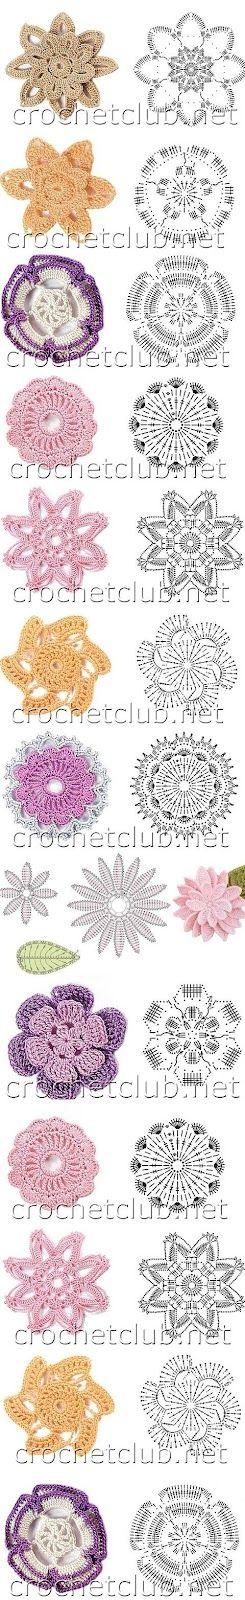 flores+de+crochet.jpeg